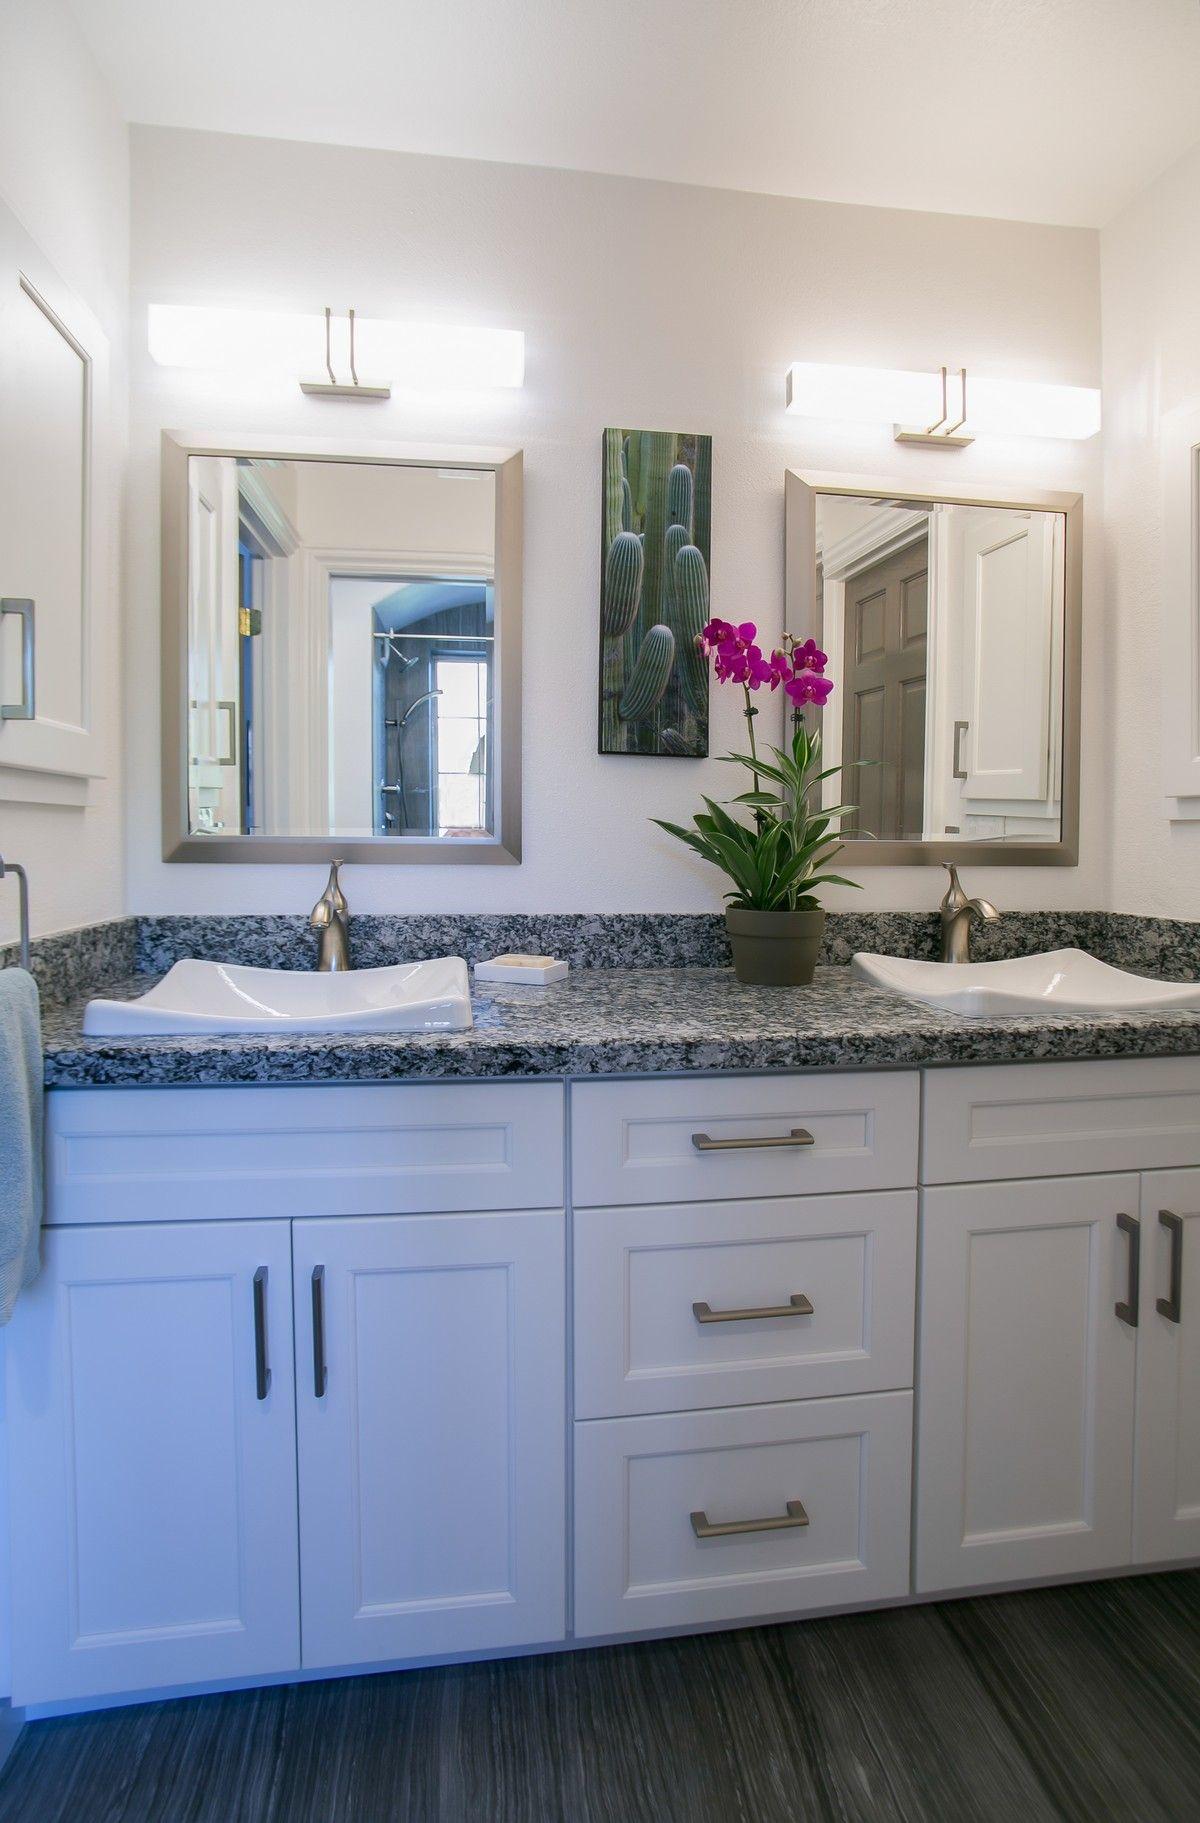 Bathrooms With Images Bath Remodel Remodel Bathroom Remodel Designs